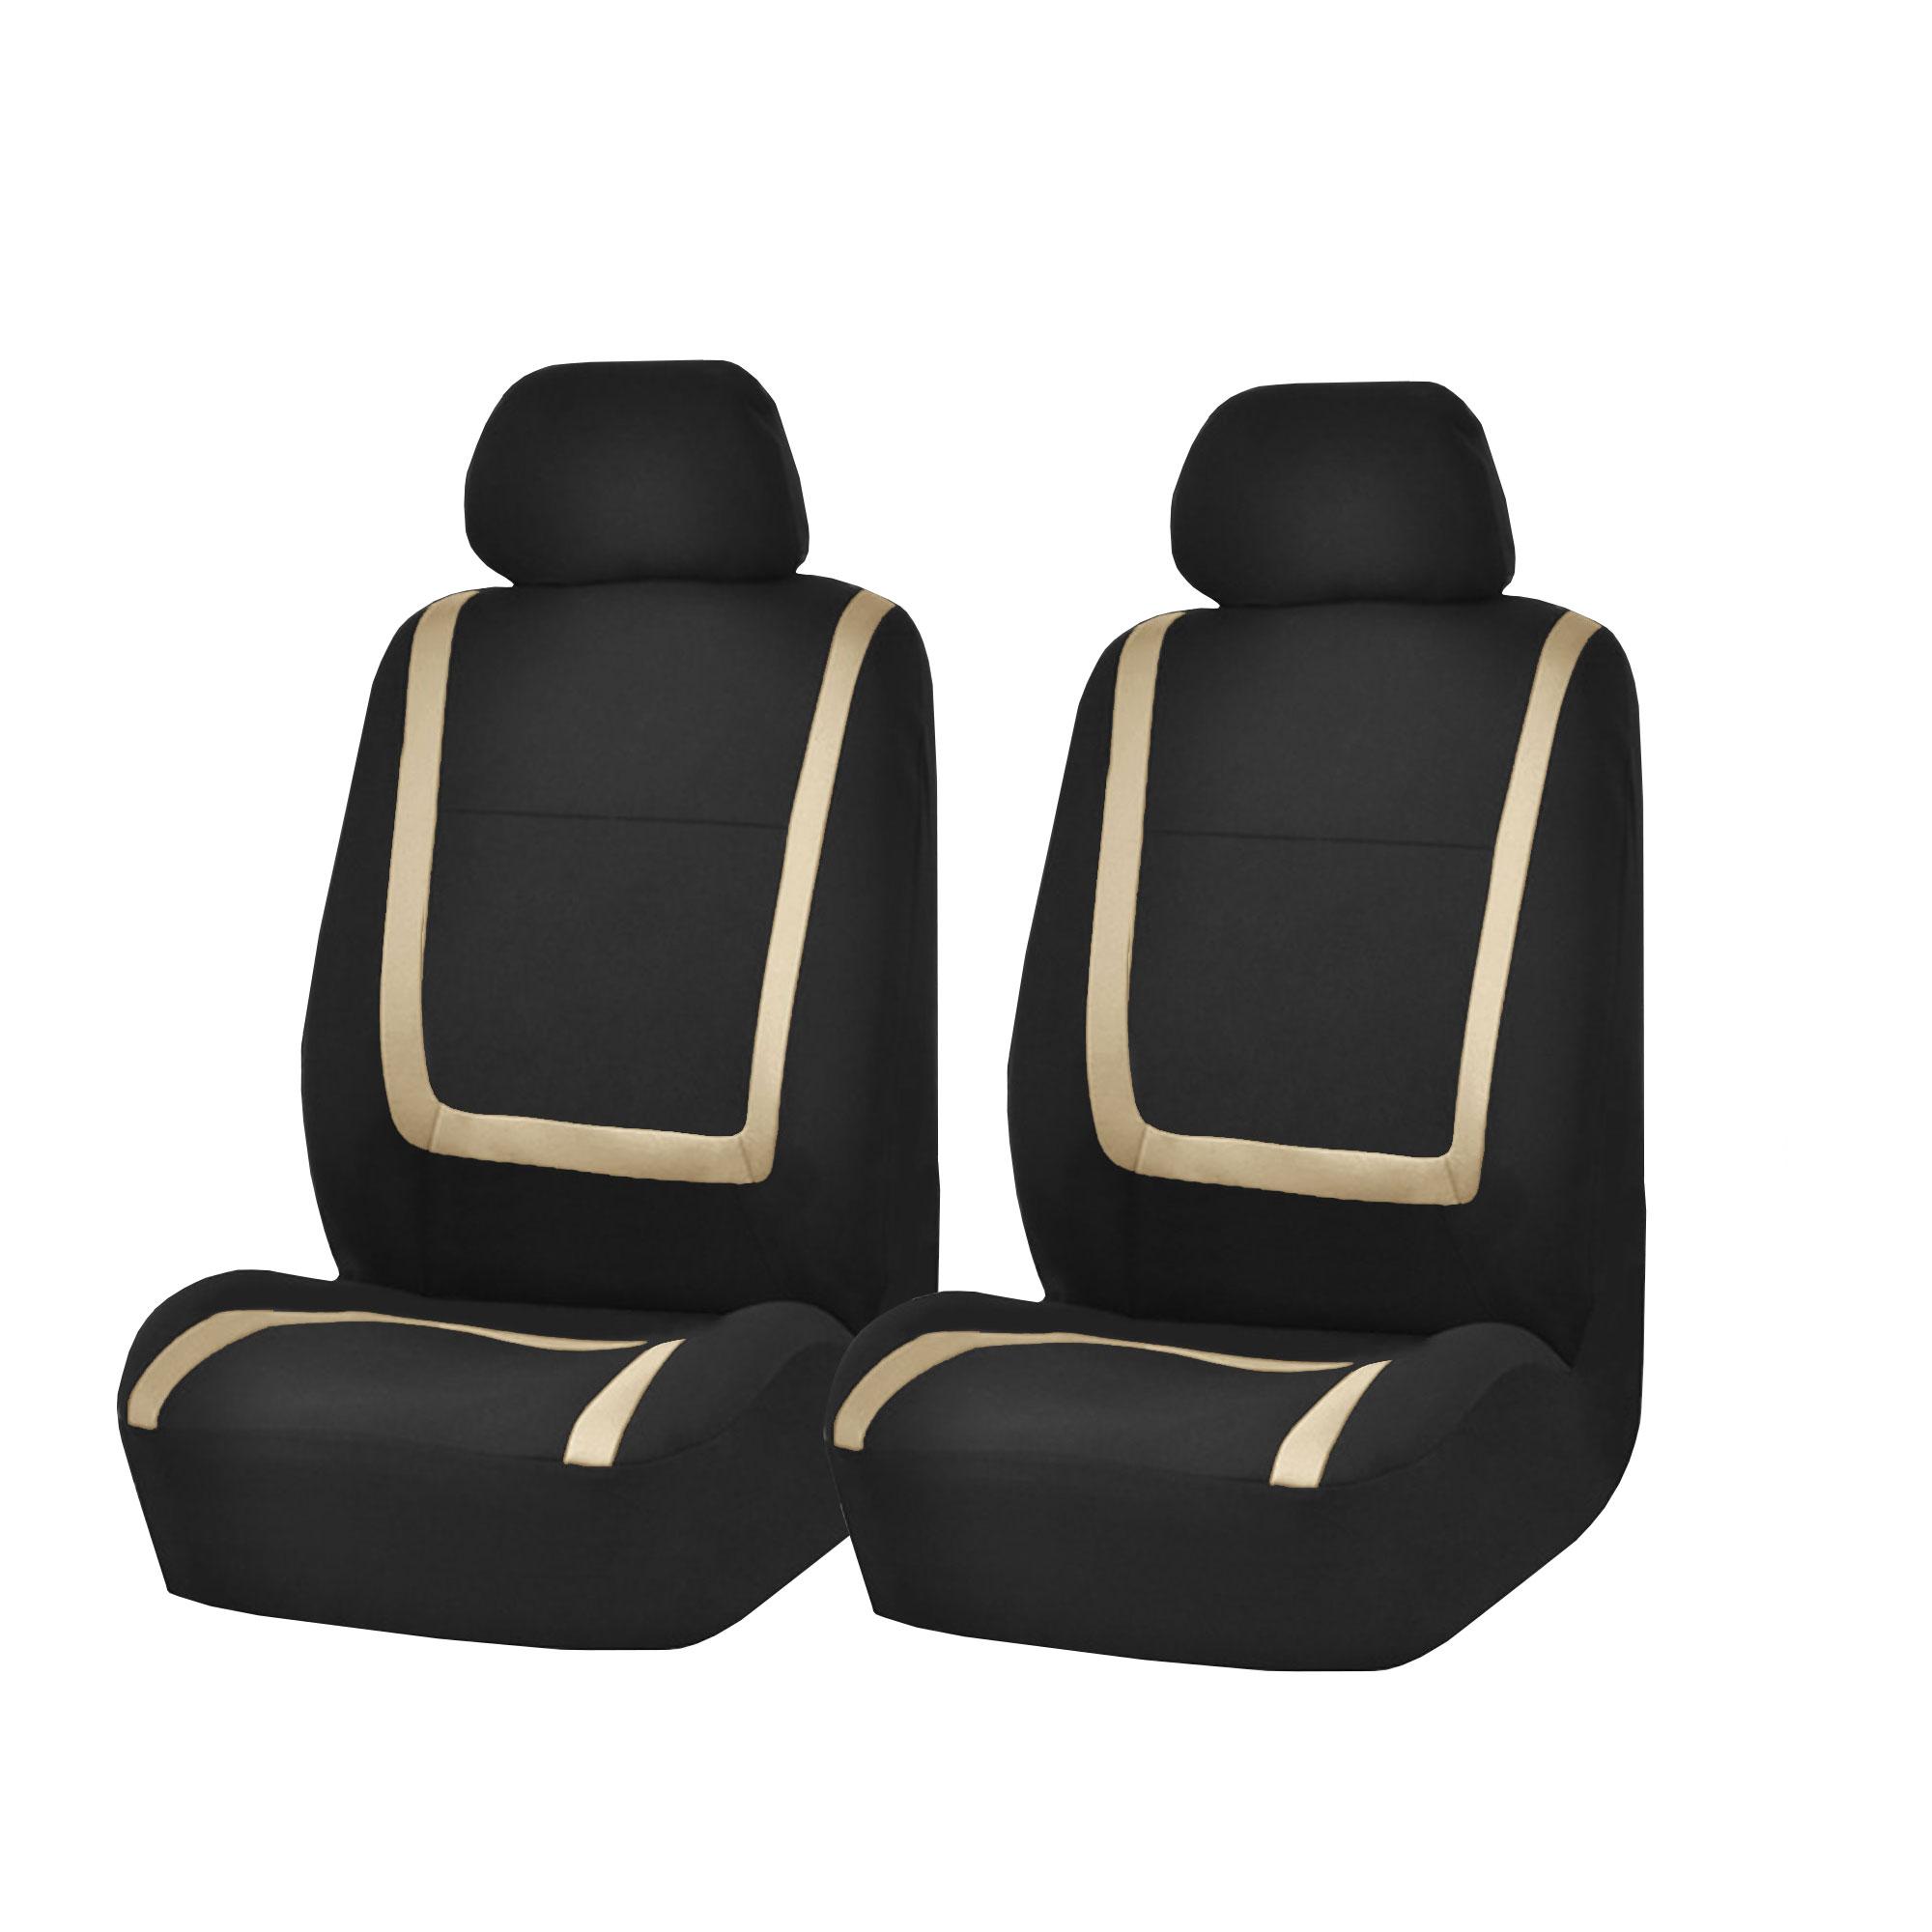 Auto Seat Covers for Car Sedan Truck Van Universal Seat Covers 12 Colors